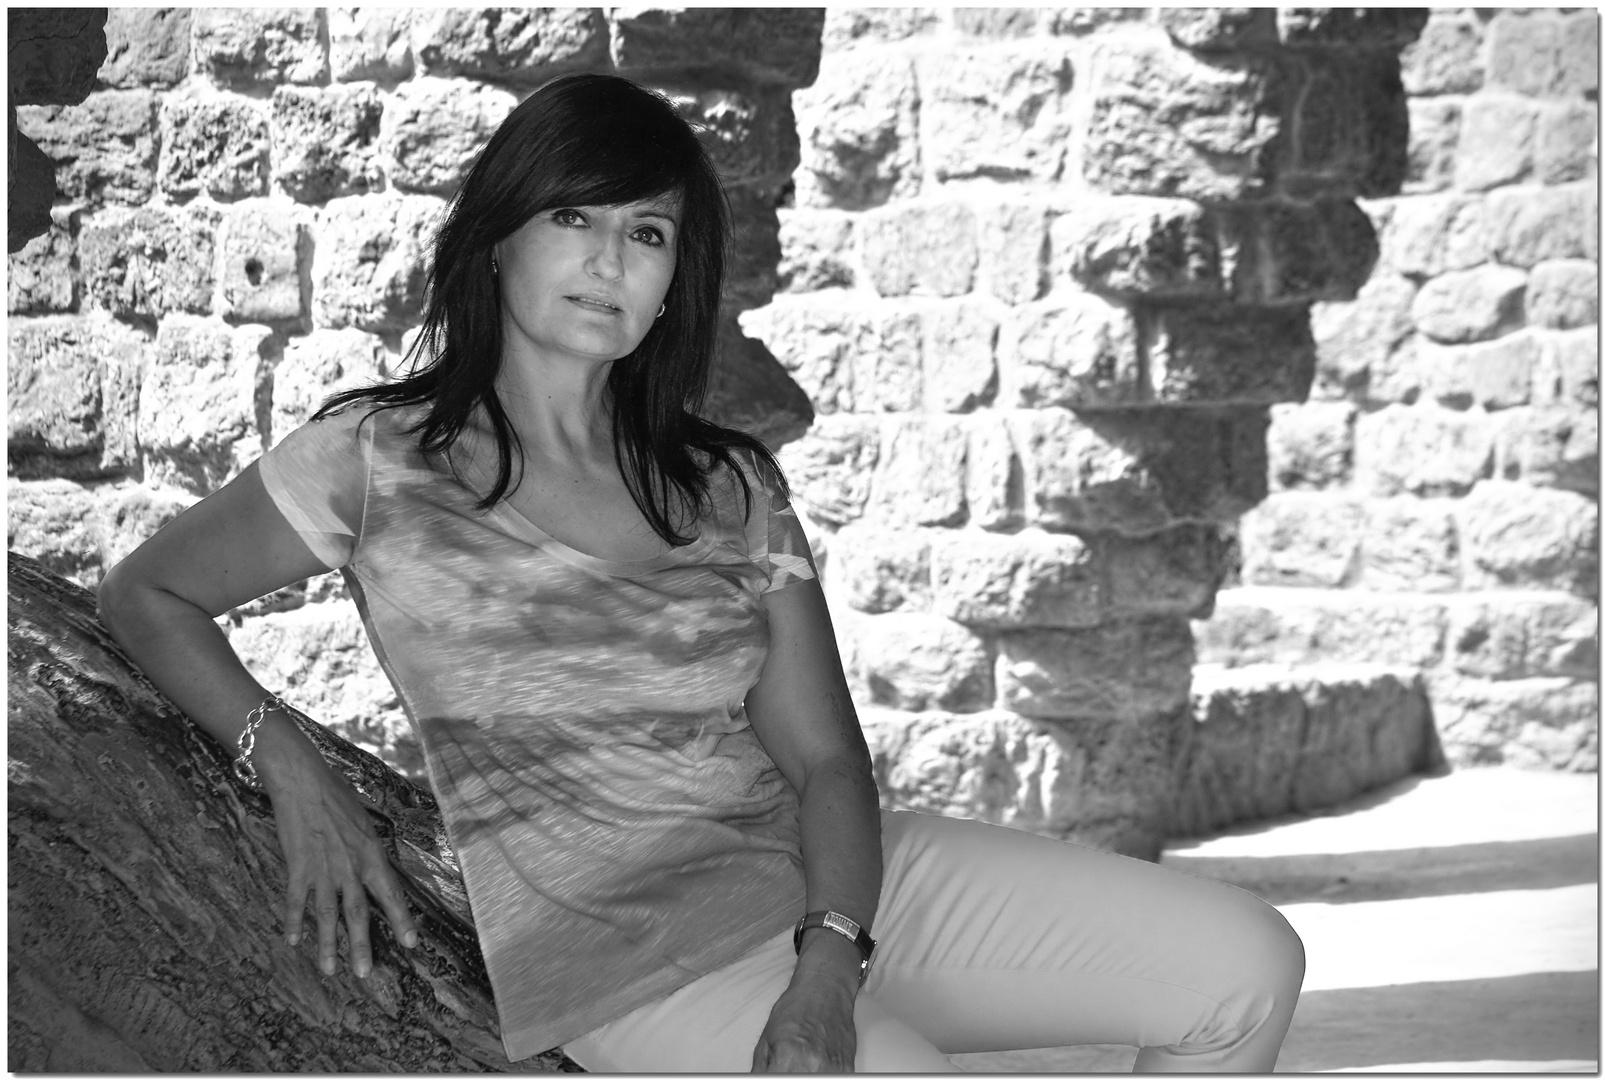 Paloma en el Parc Güell. ¿Fotógrafa? ¿Modelo? ¡Artista!